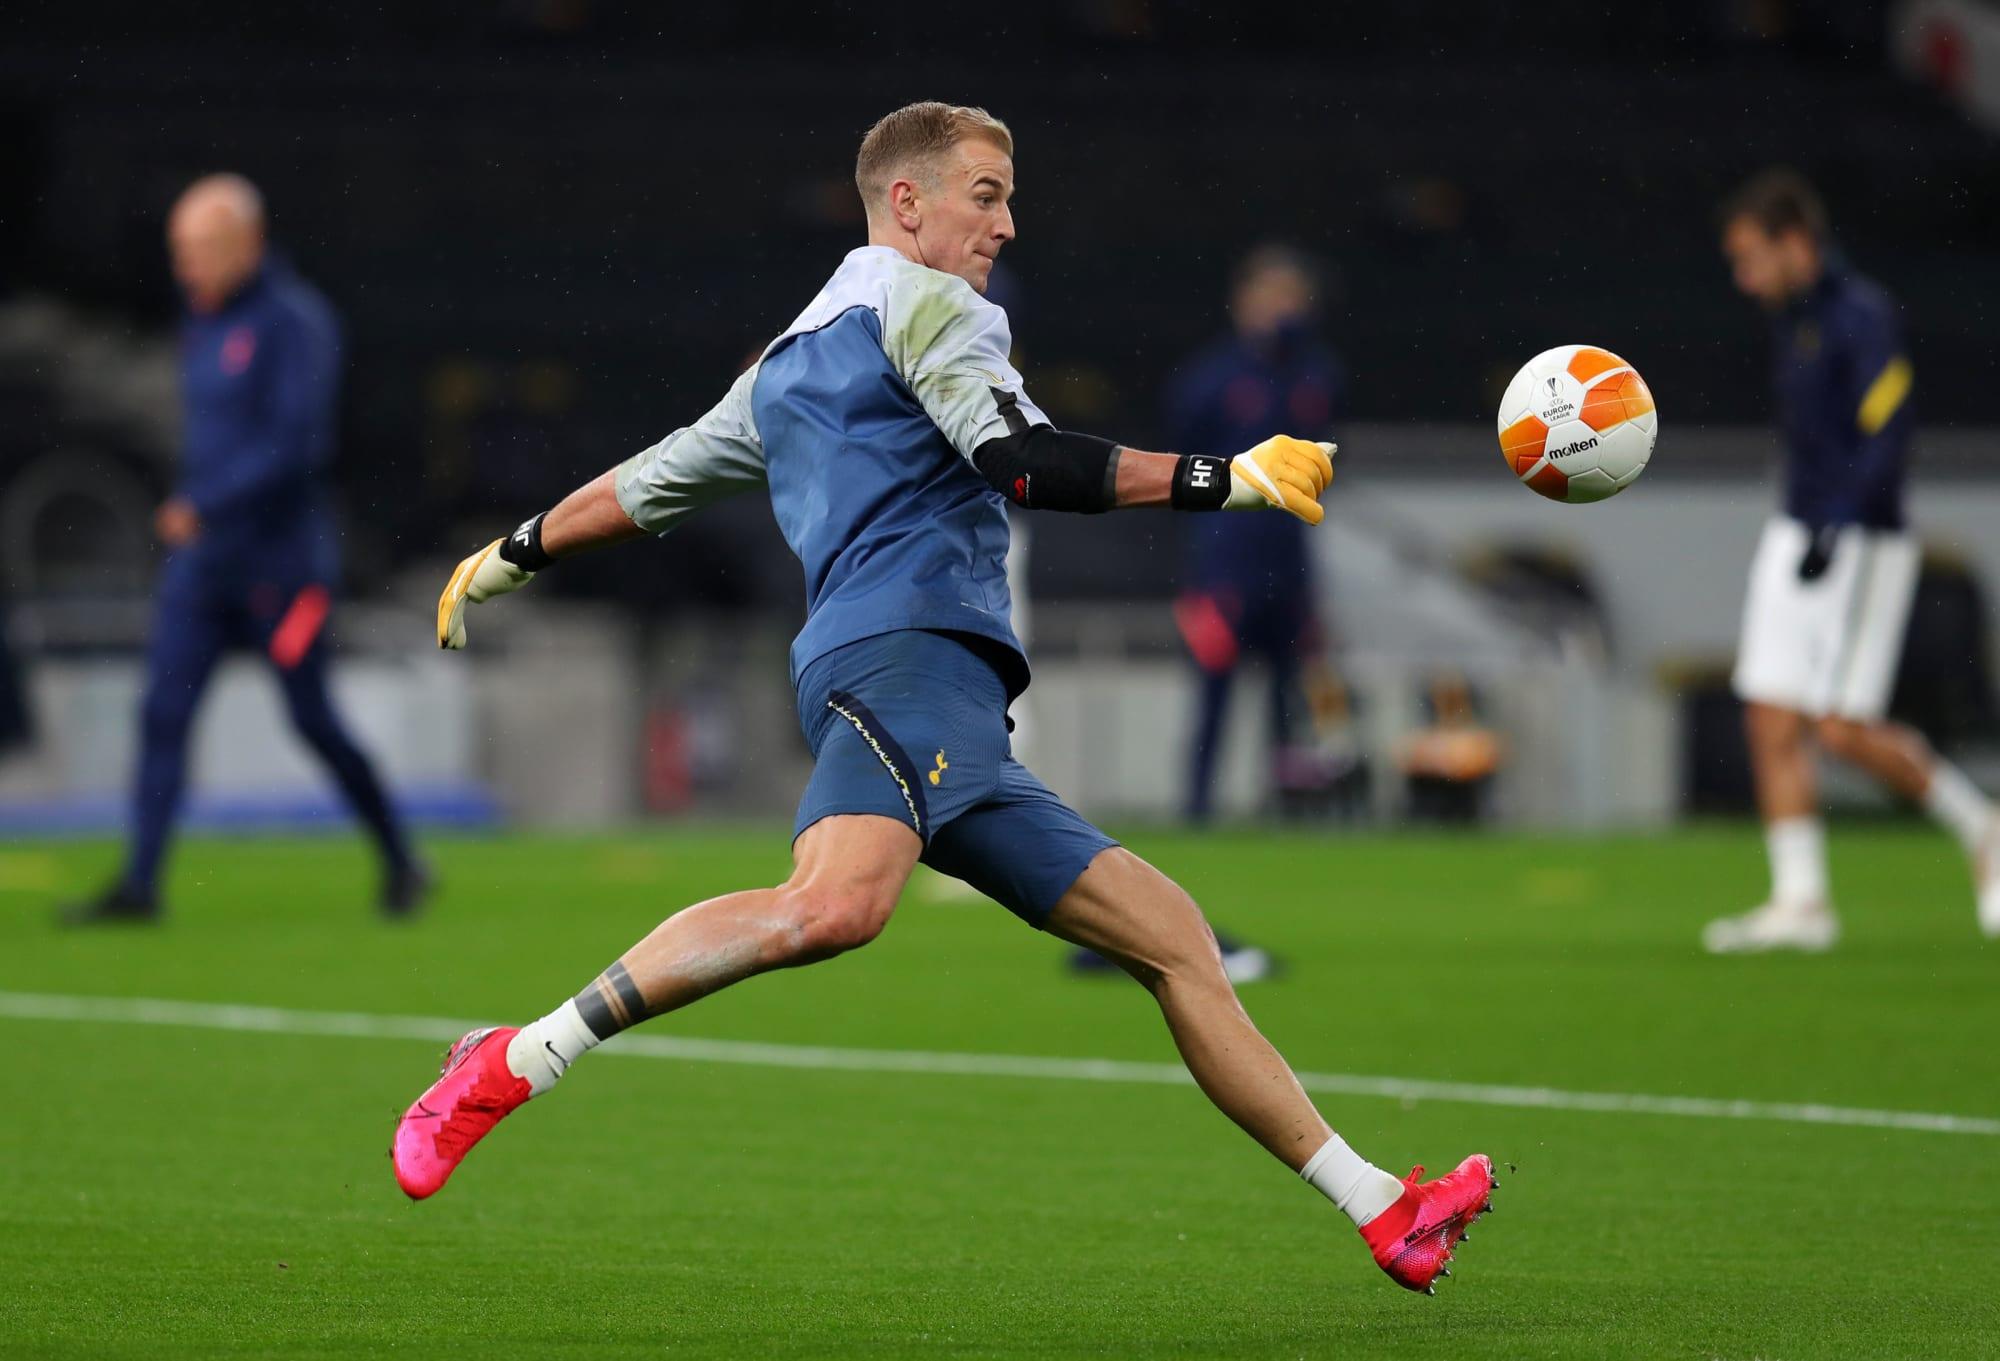 Hart Shows What He Brings in Tottenham Shutout of LASK